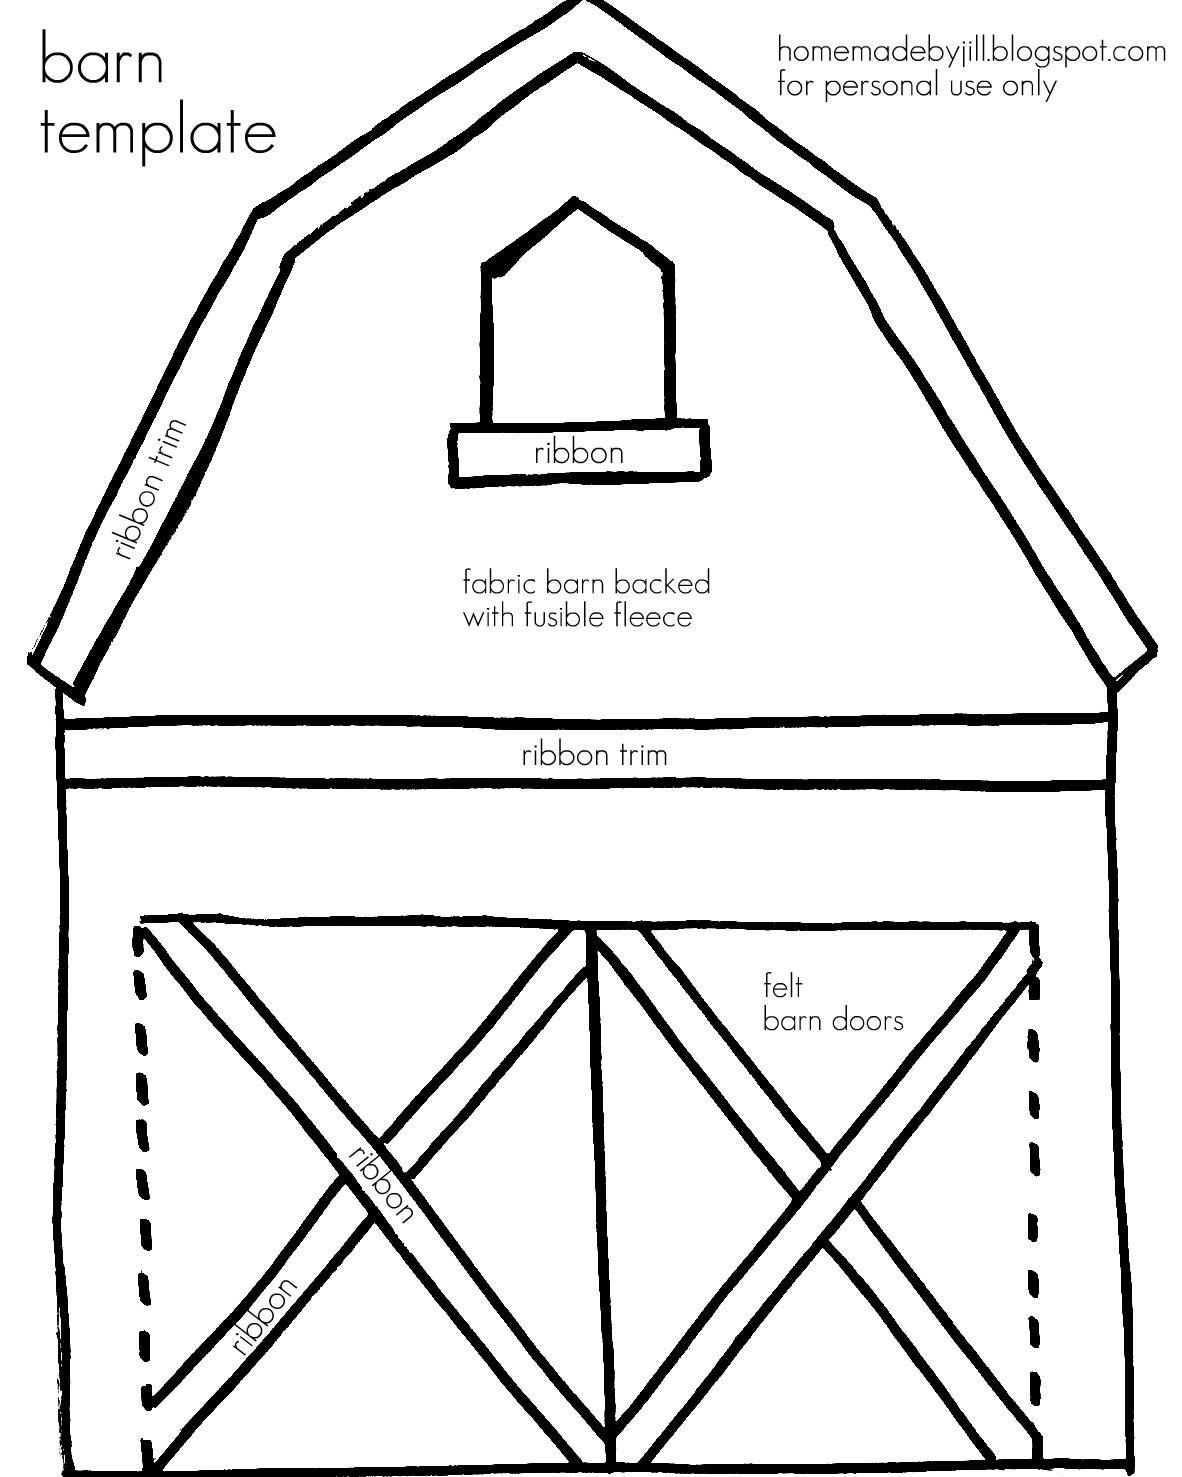 barn templates homemade by jill